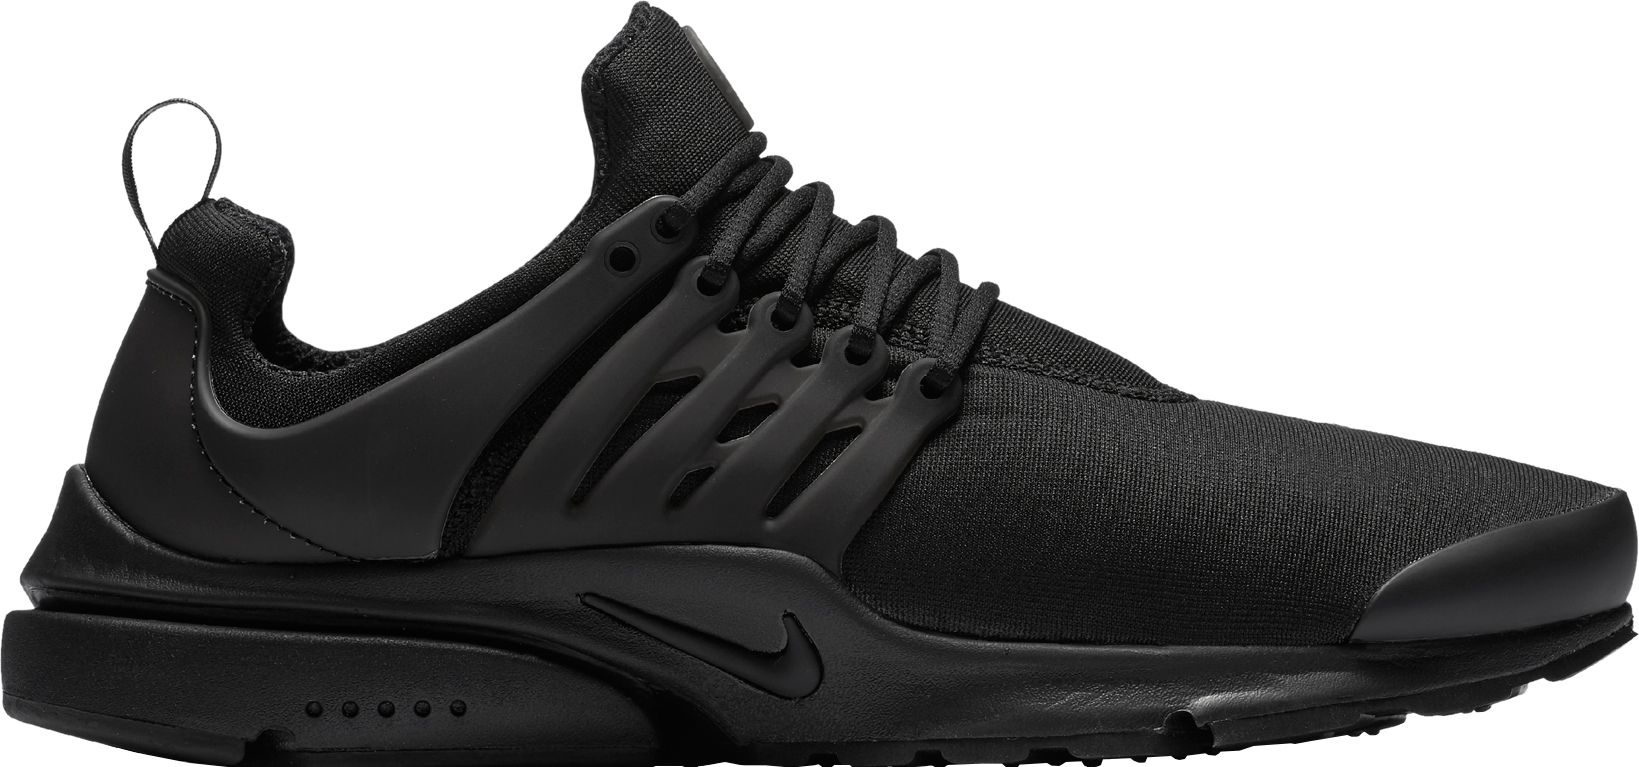 Nike Men's Air Presto Essential Shoes DICK'S Sporting Goods